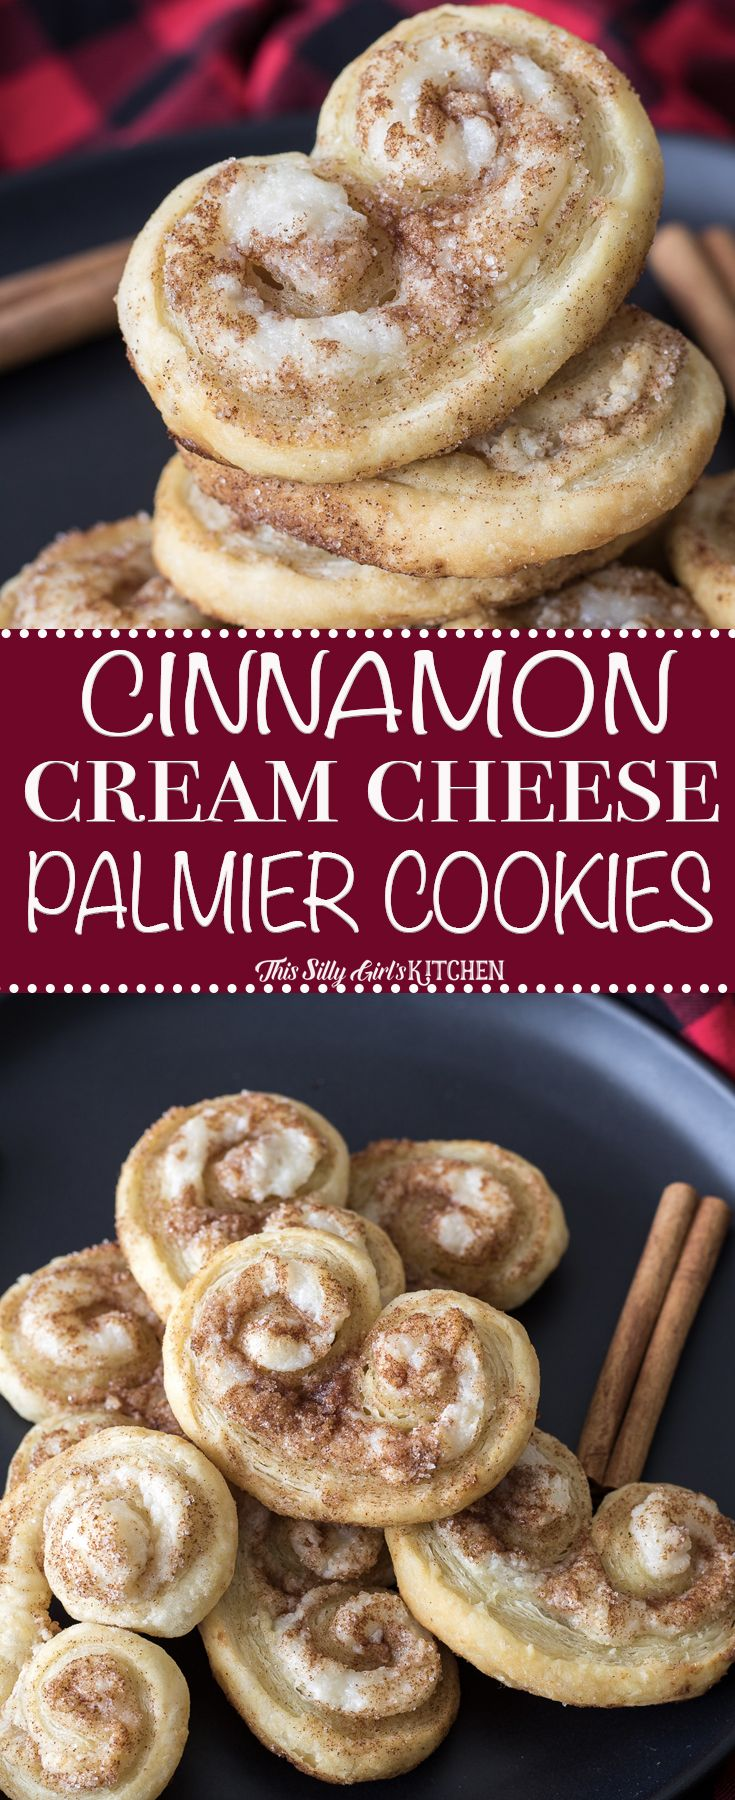 Easy Cinnamon Cream Cheese Palmier Cookies